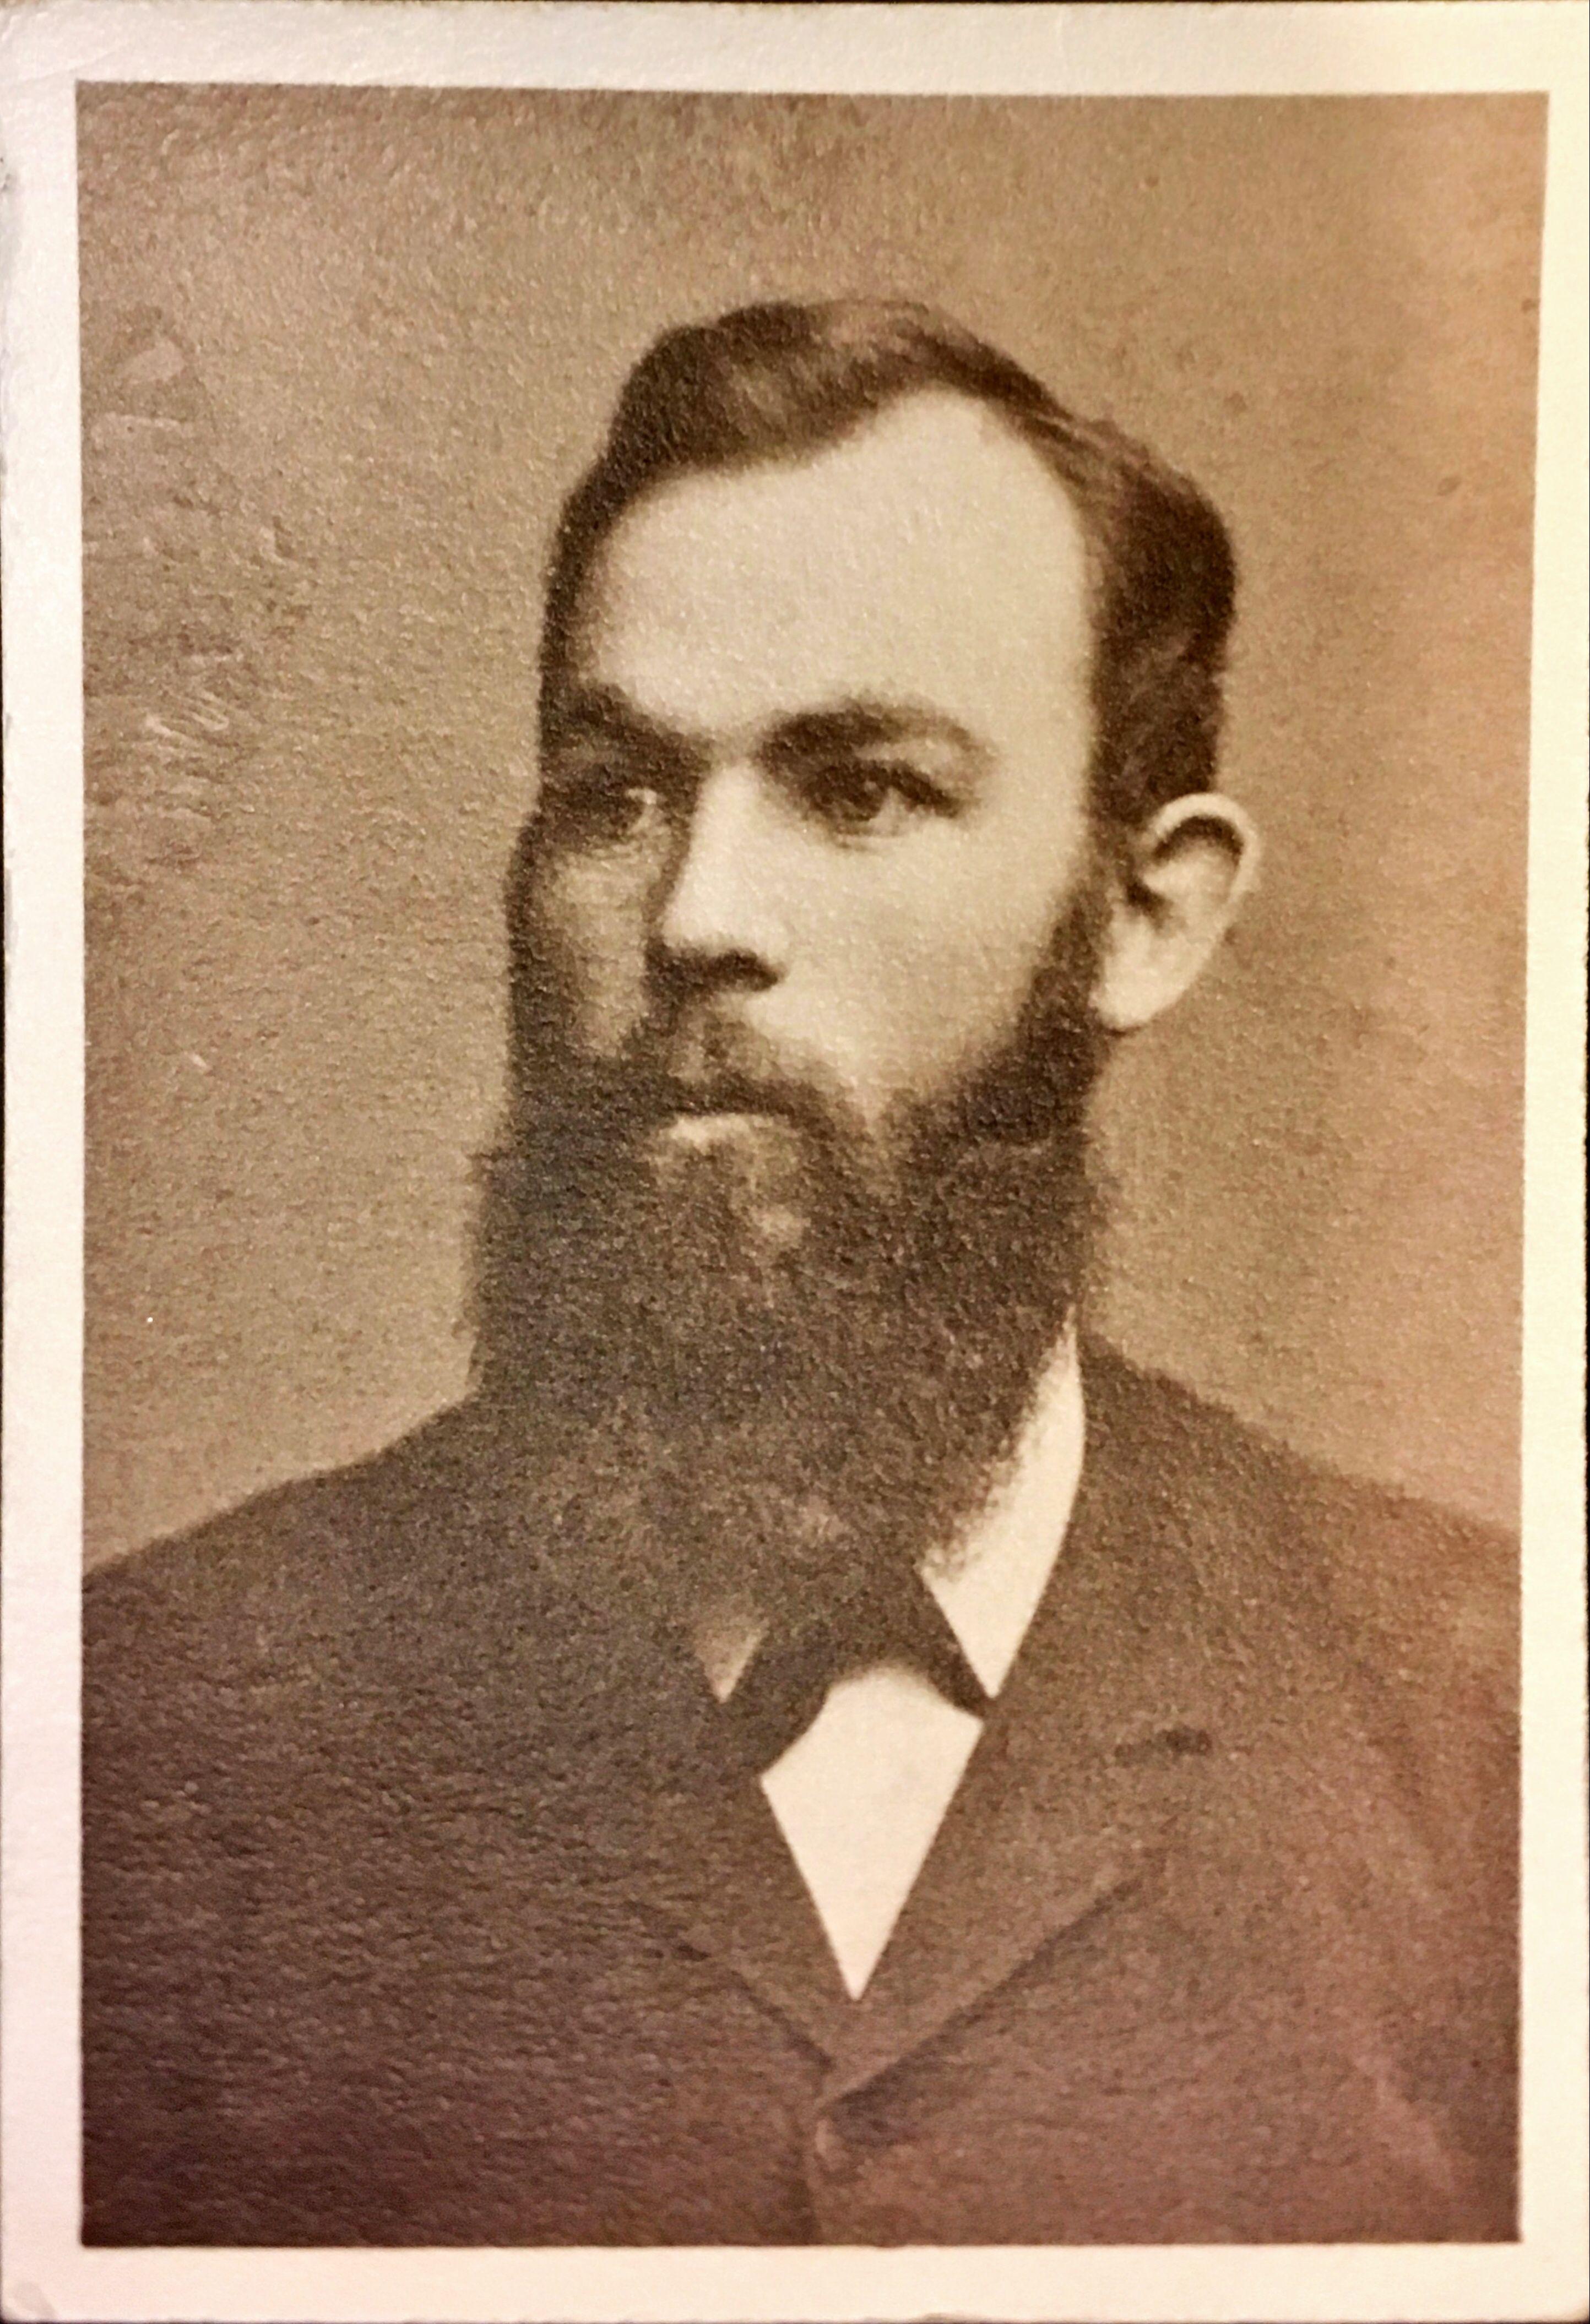 Carlson, John Jacob